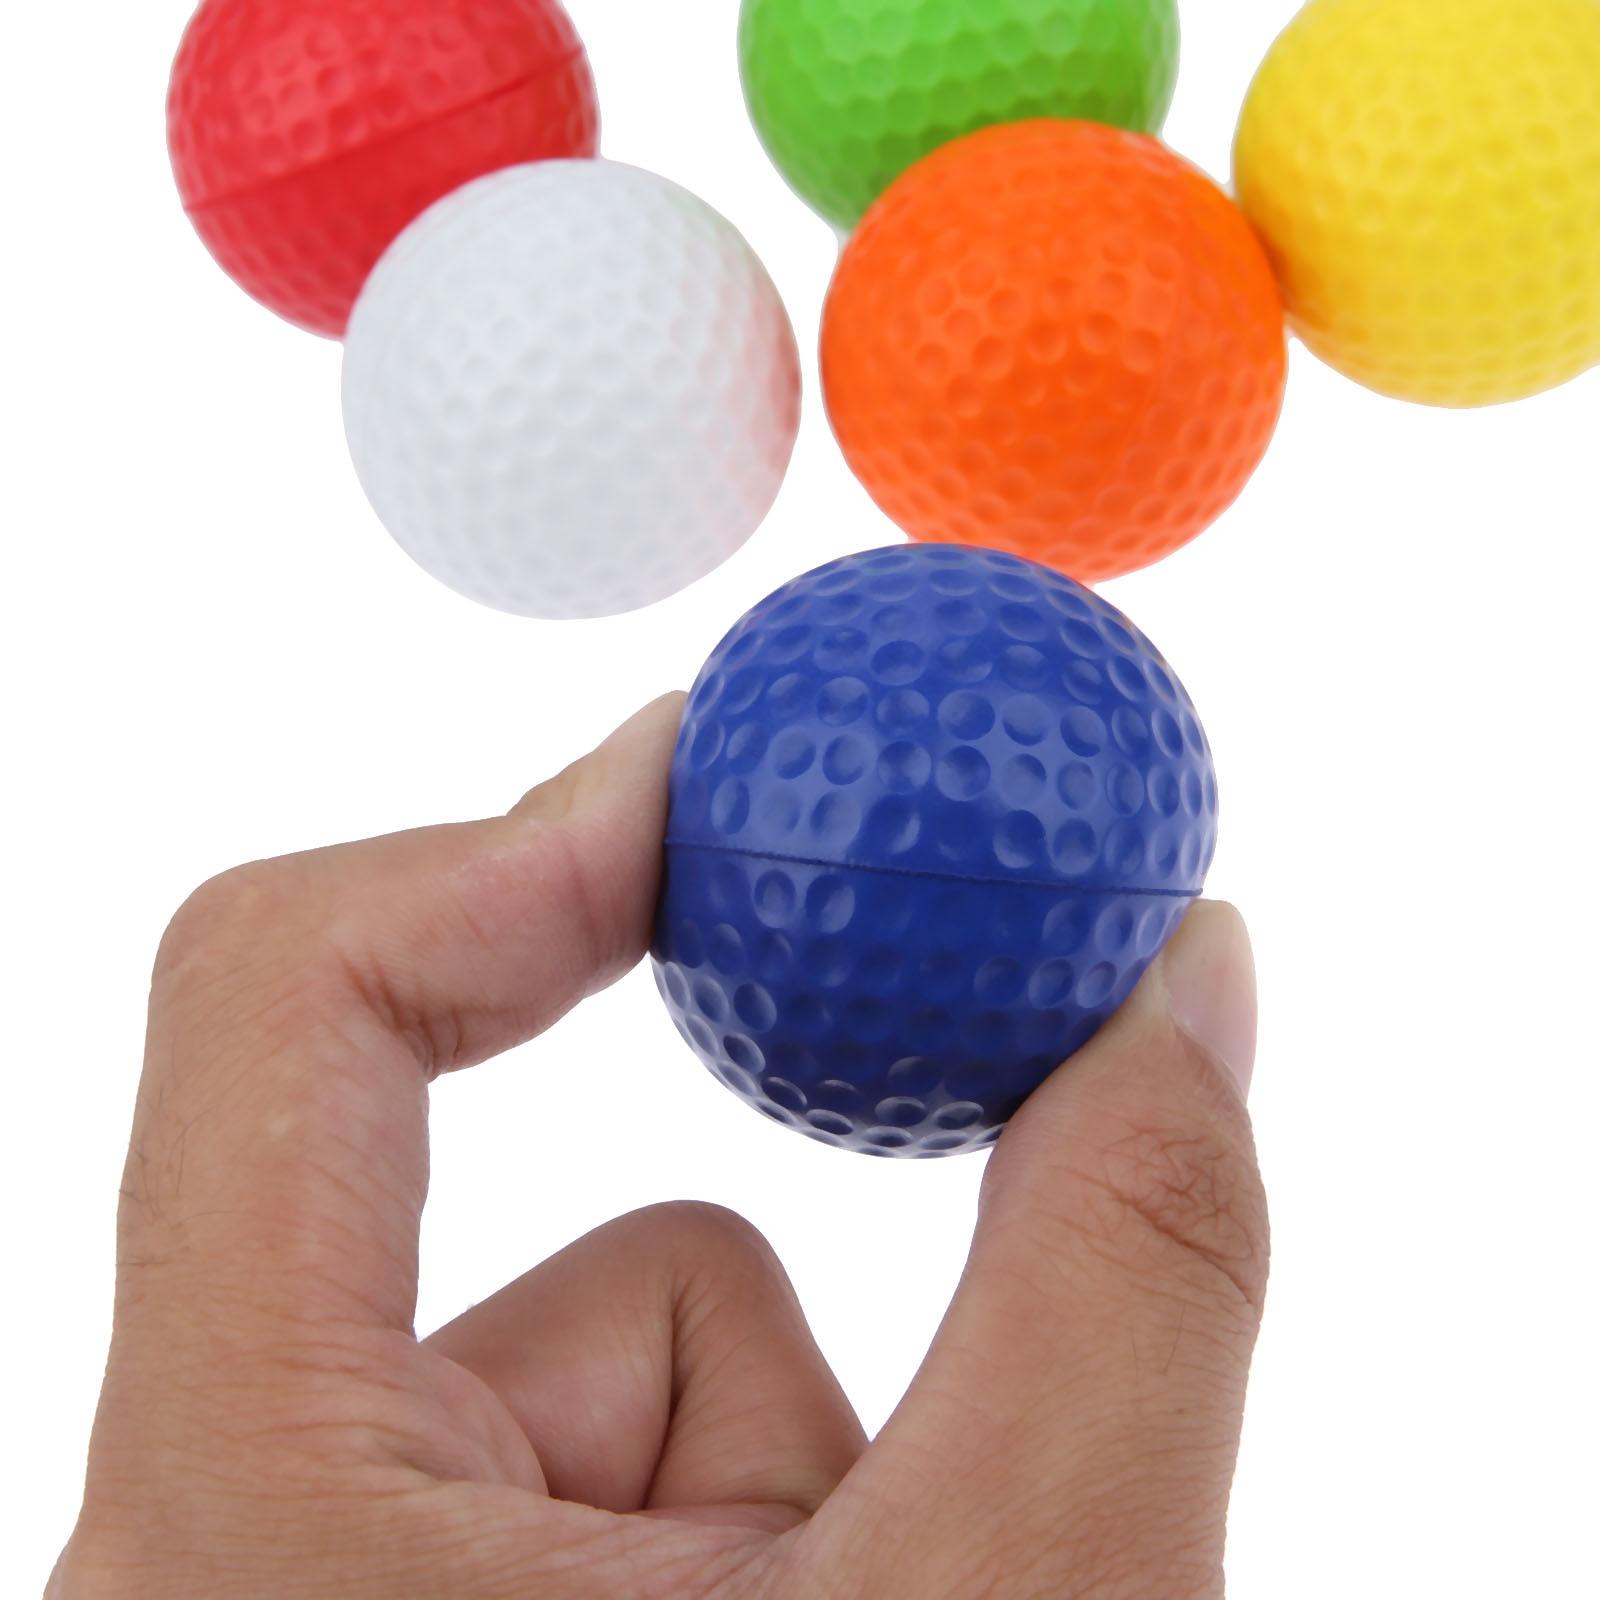 SURIEEN 20Pcs Light Foam Golf Balls for Indoor Outdoor Golf Practice Balls PU Material Sport Training Sponge Golf Balls 6 Colors